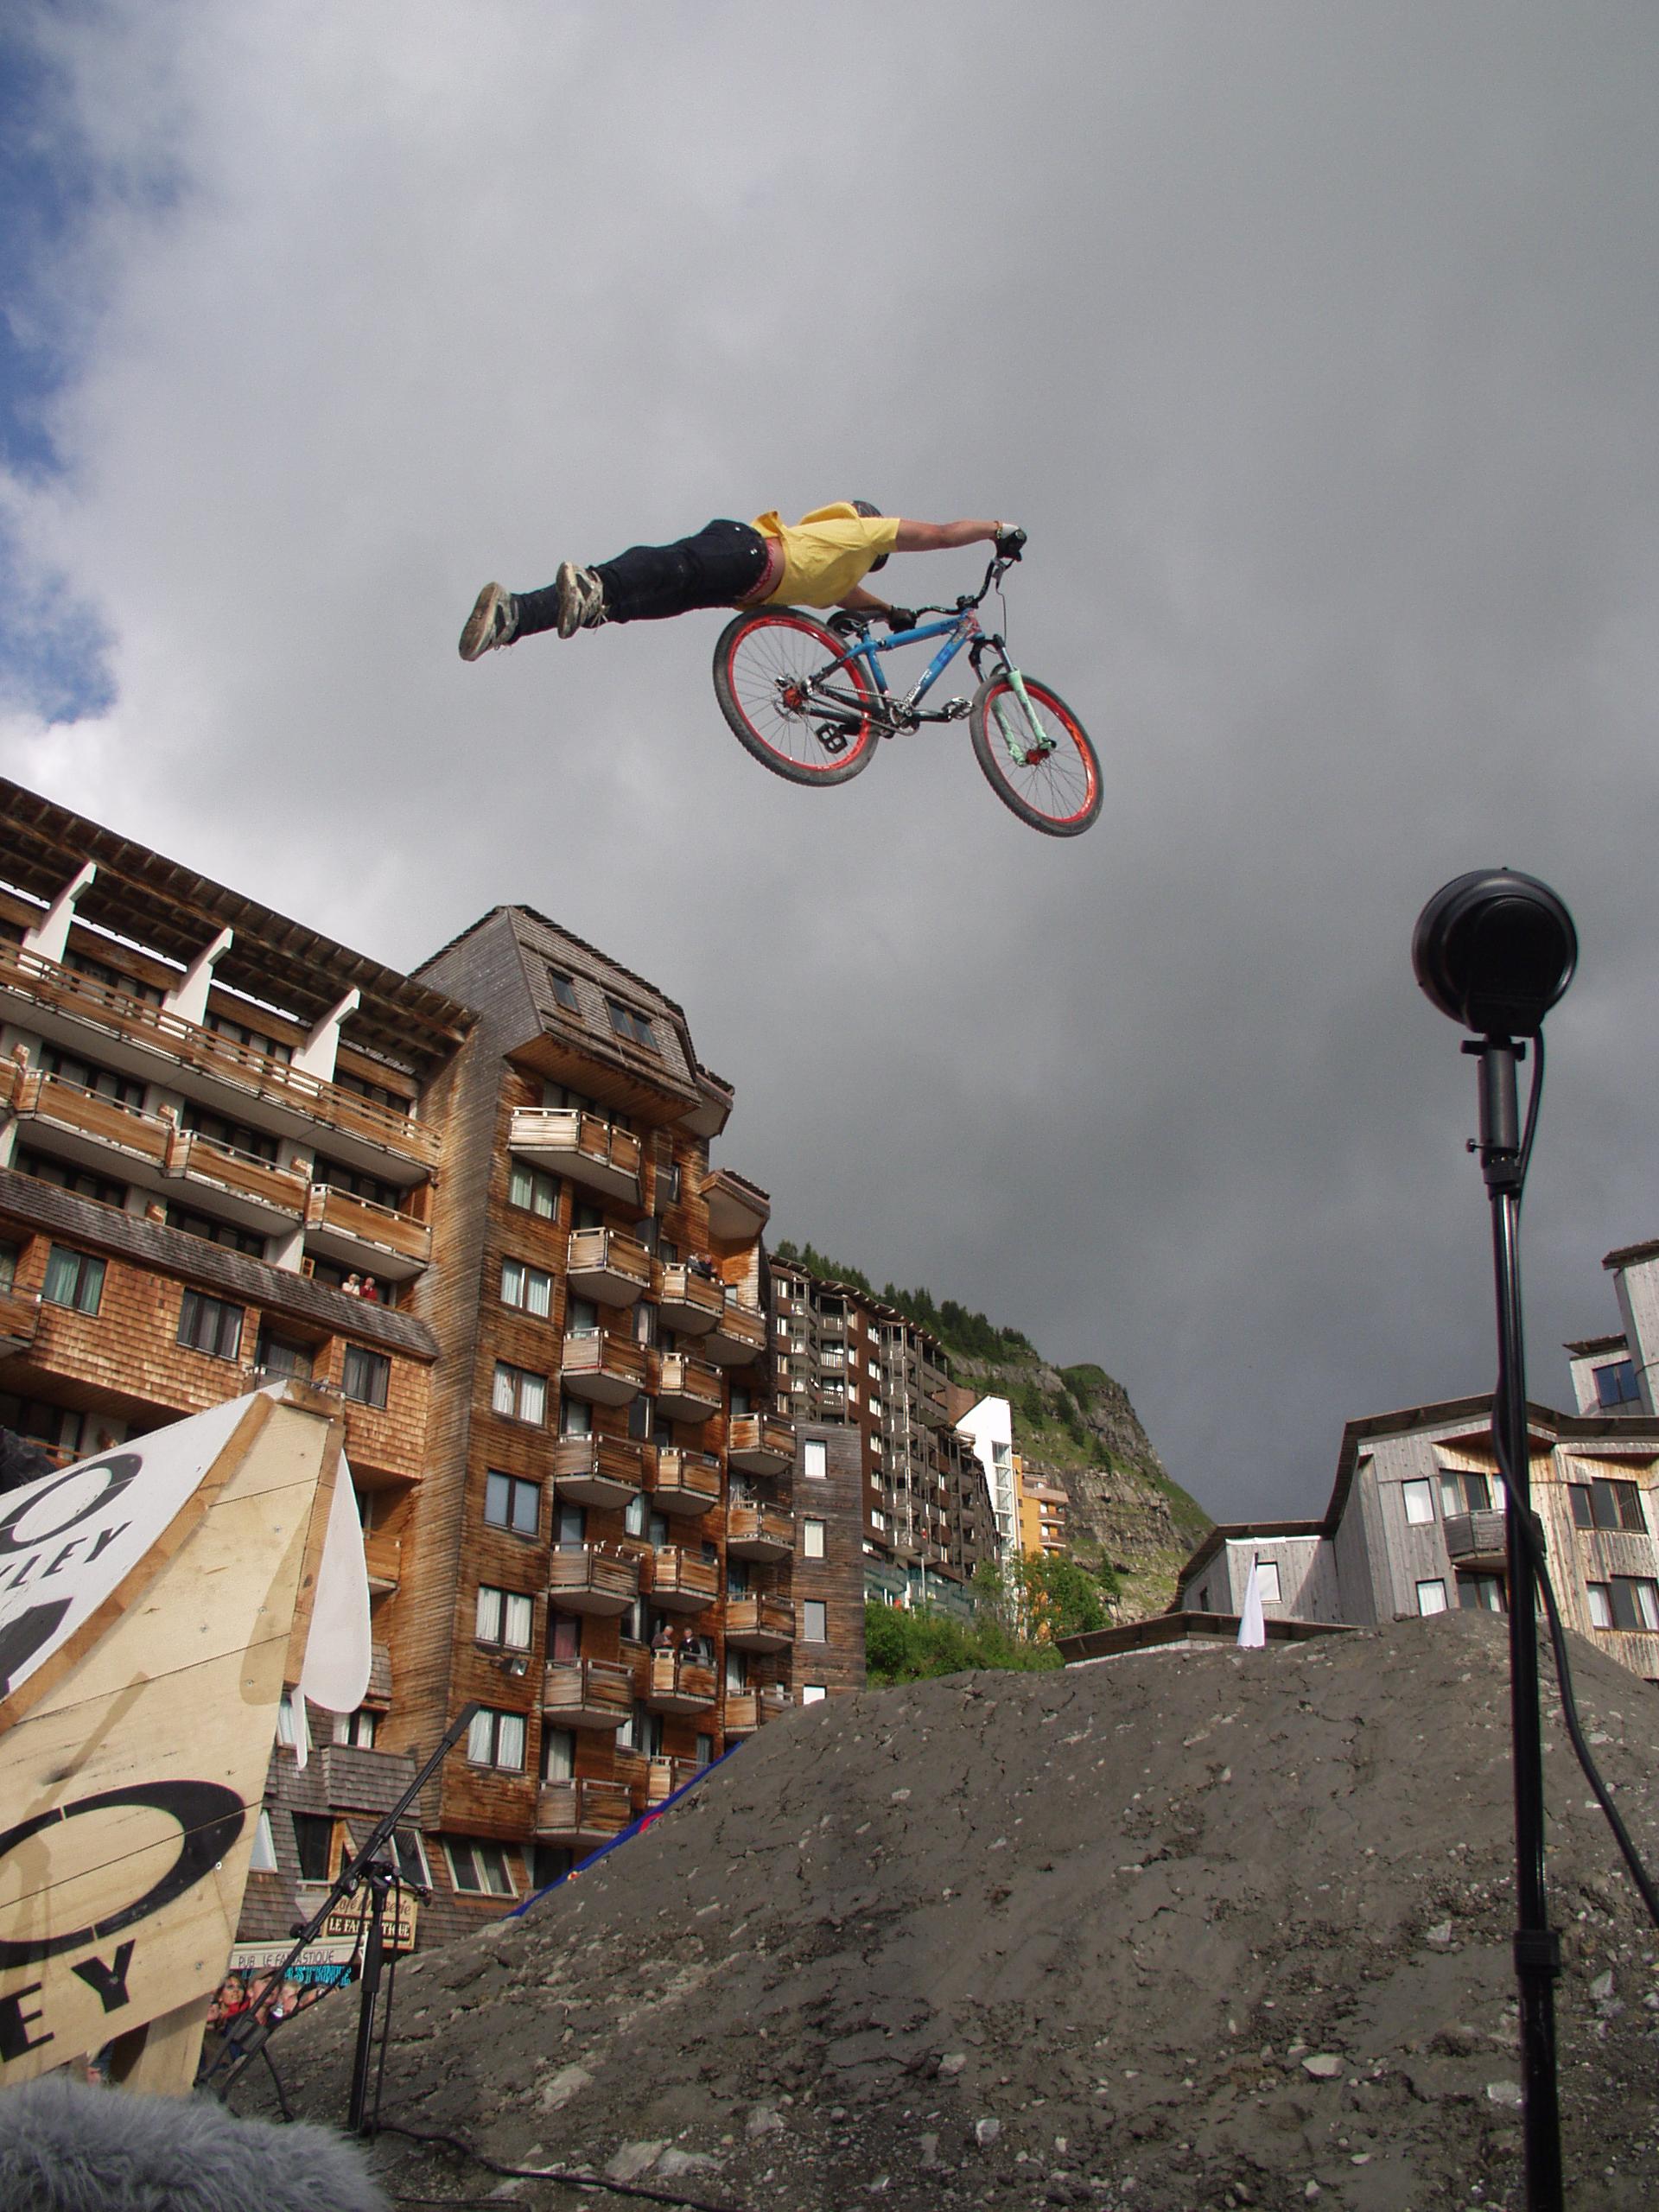 Bike Tricks Names Superman